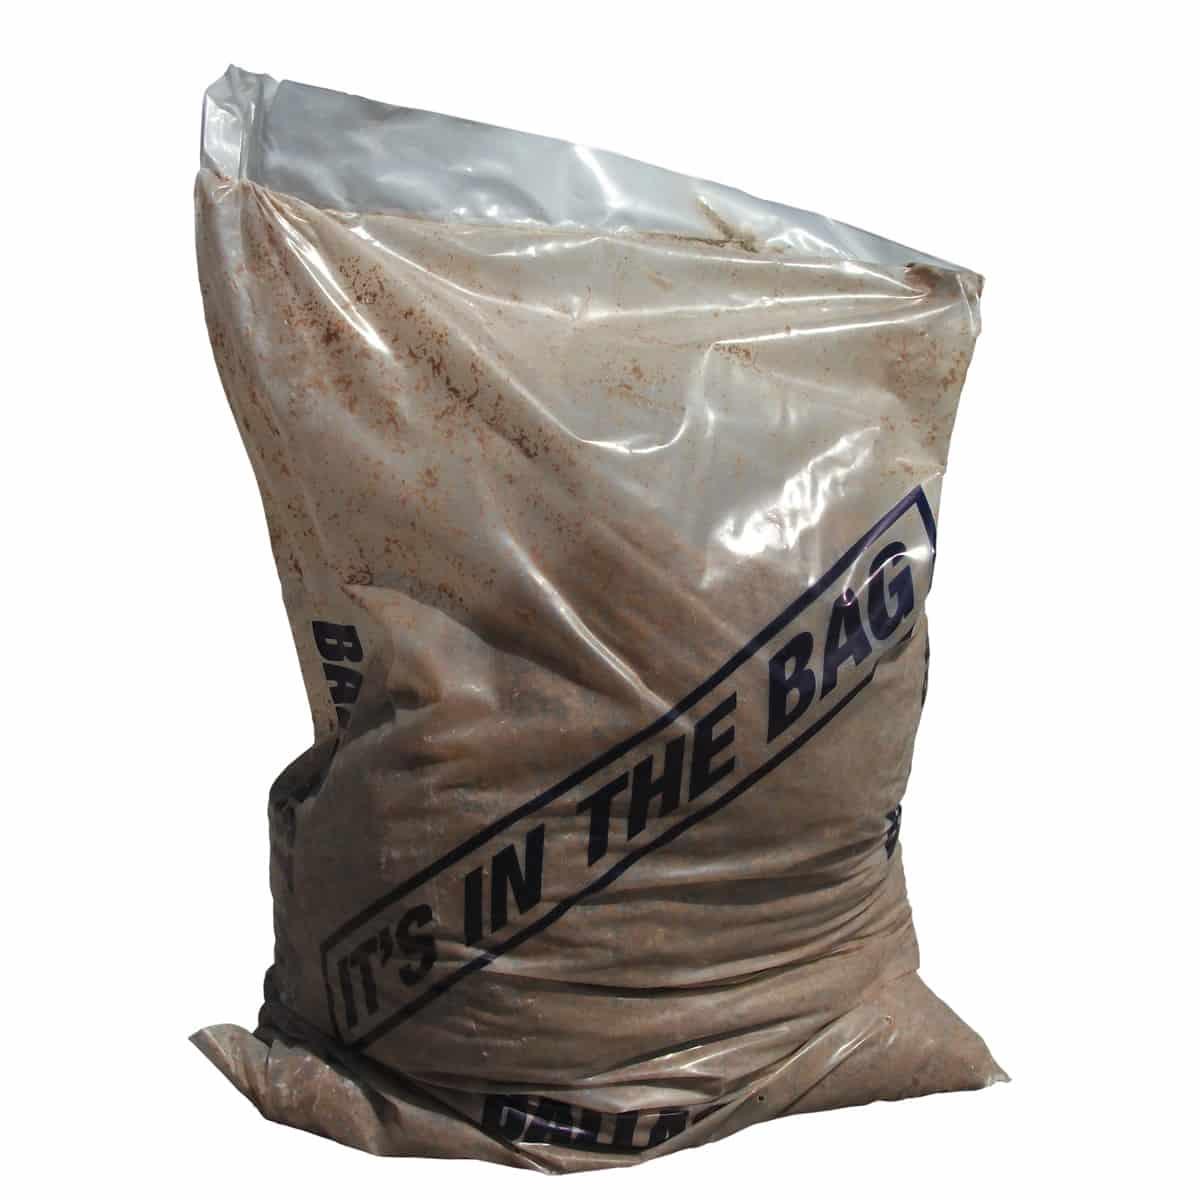 Fencing Ballast – 25kg bag